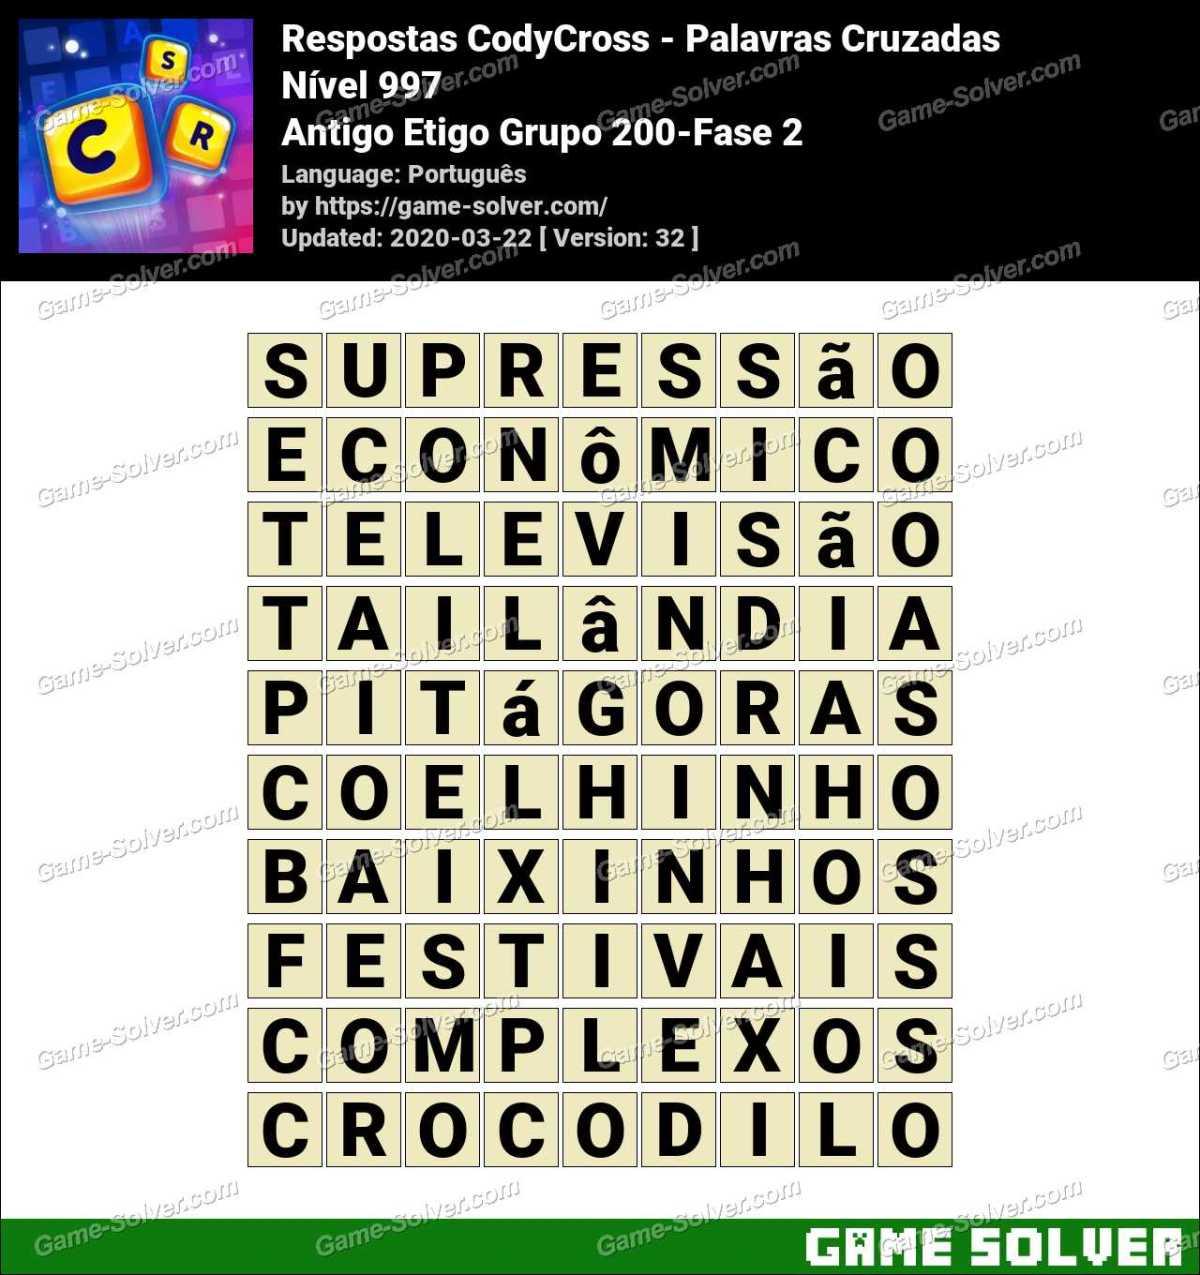 Respostas CodyCross Antigo Etigo Grupo 200-Fase 2